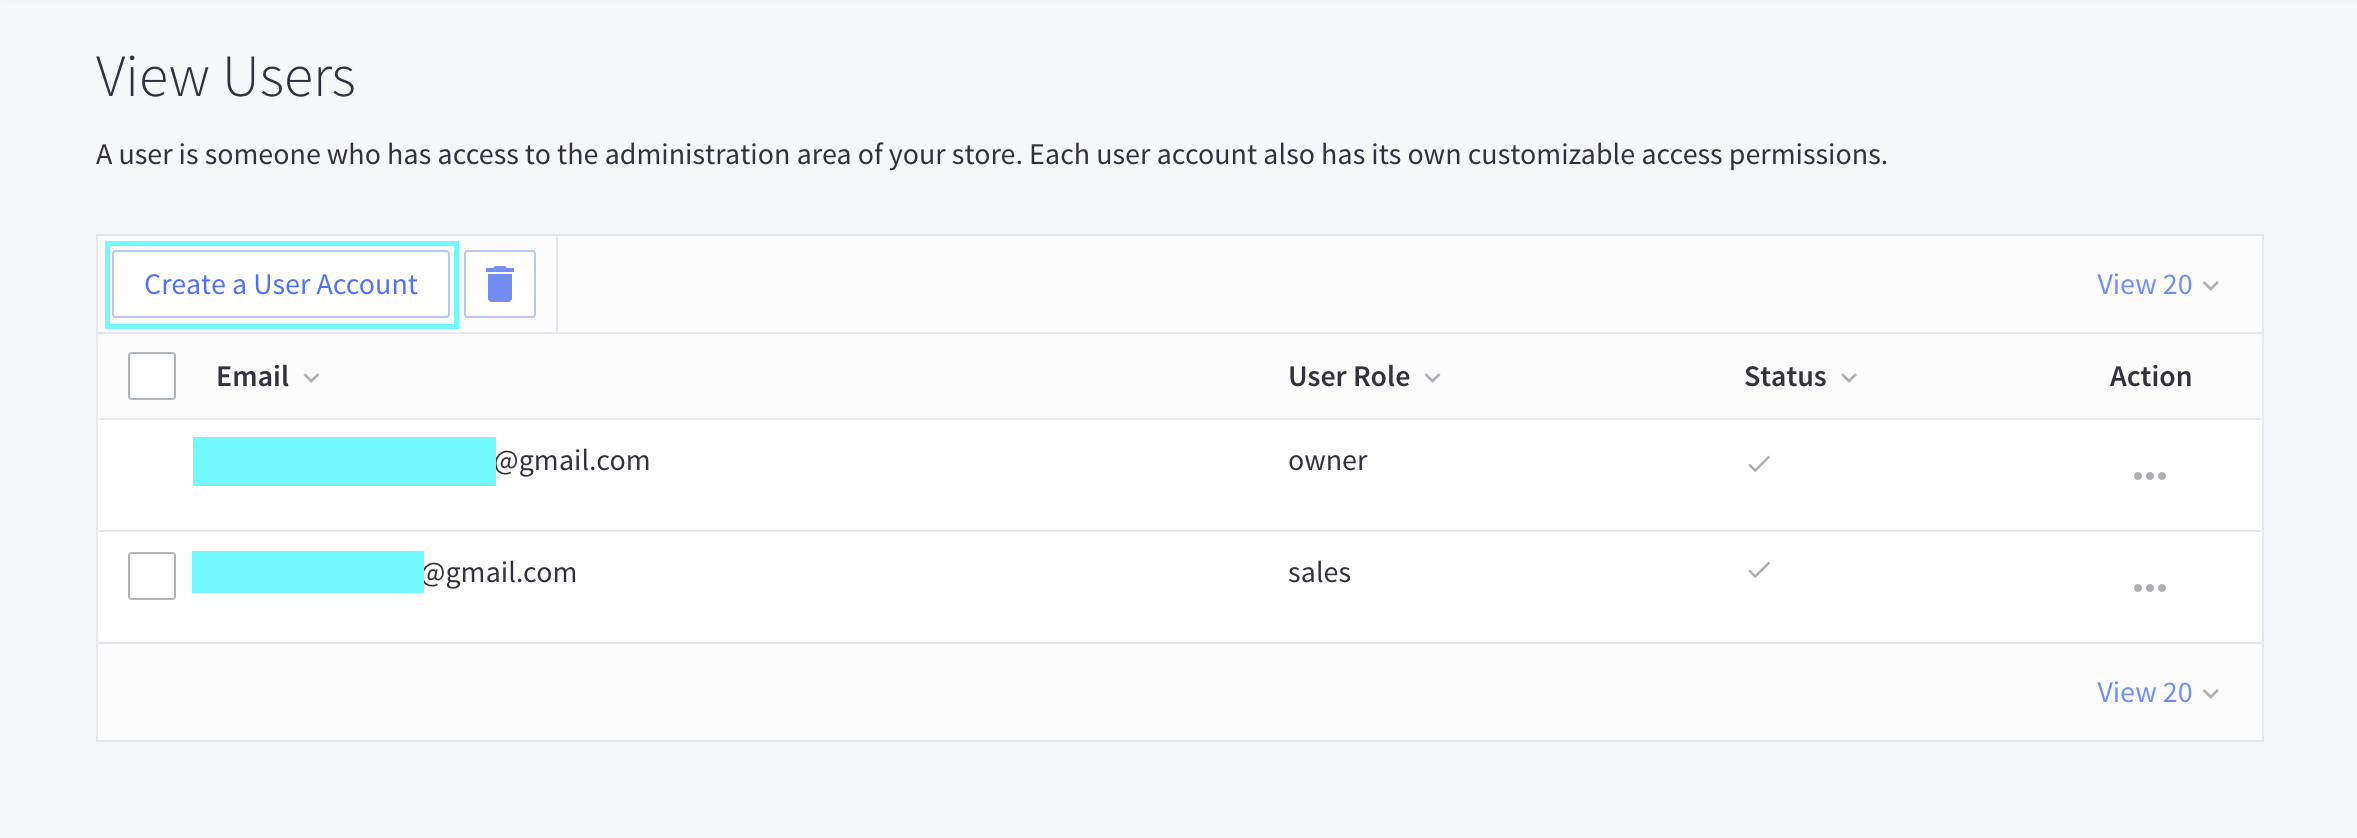 Create a User Account